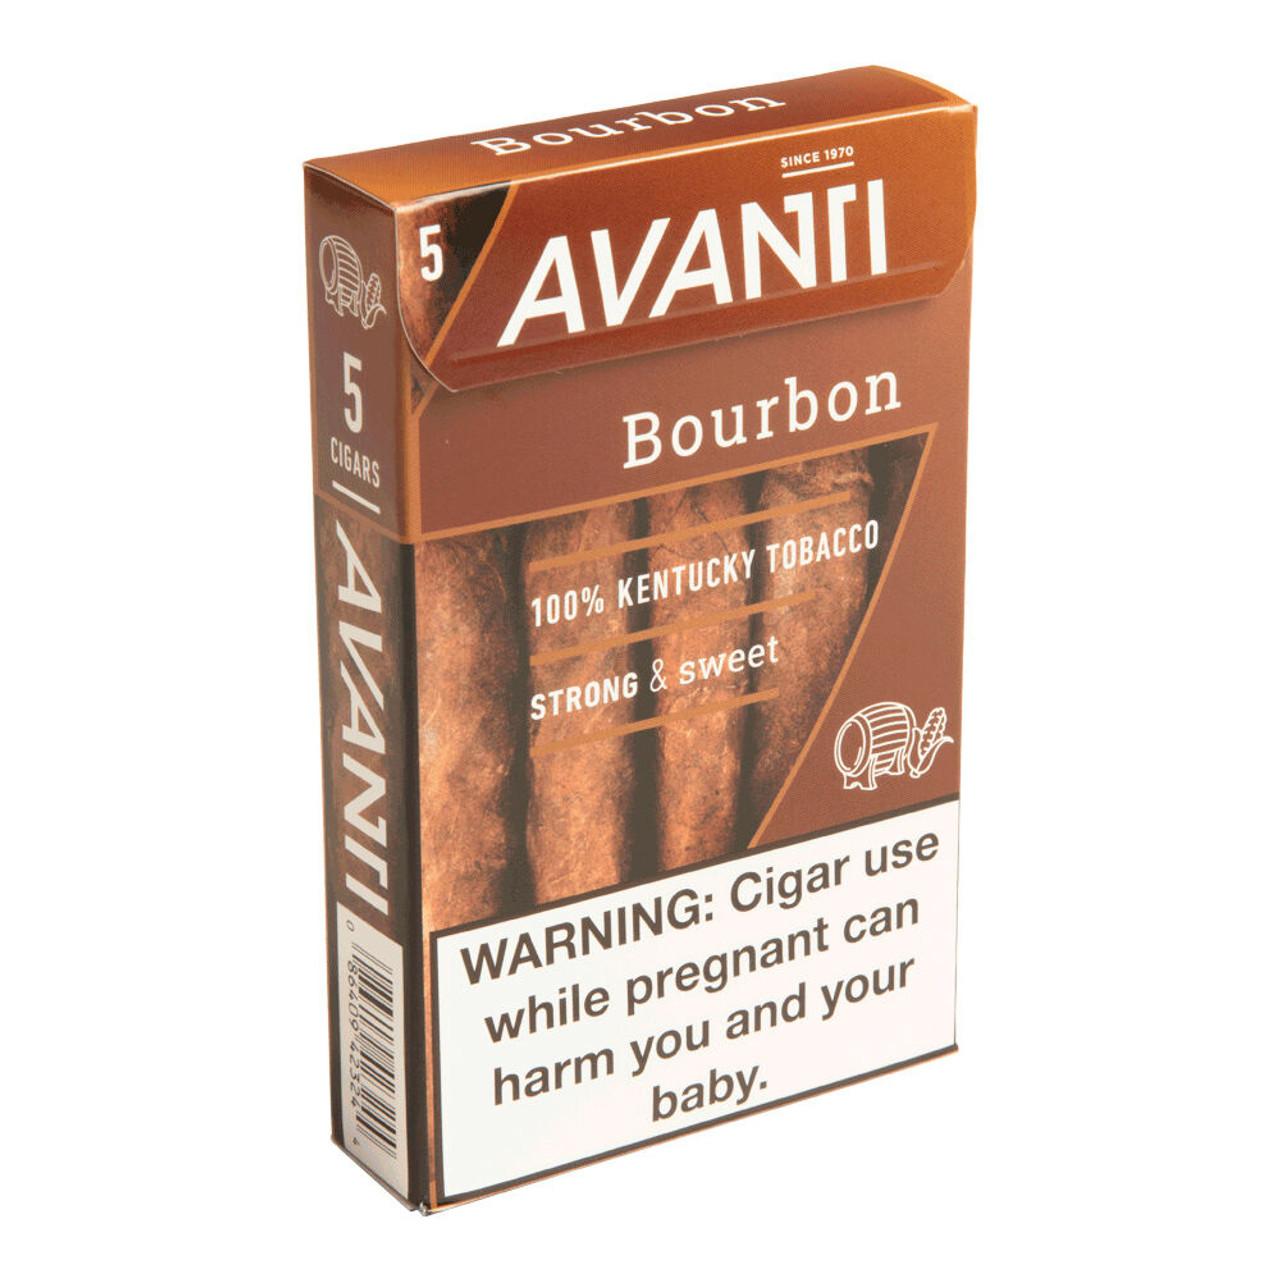 Avanti Bourbon Cigars - 4.5 x 34 (10 Packs of 5 (50 total))